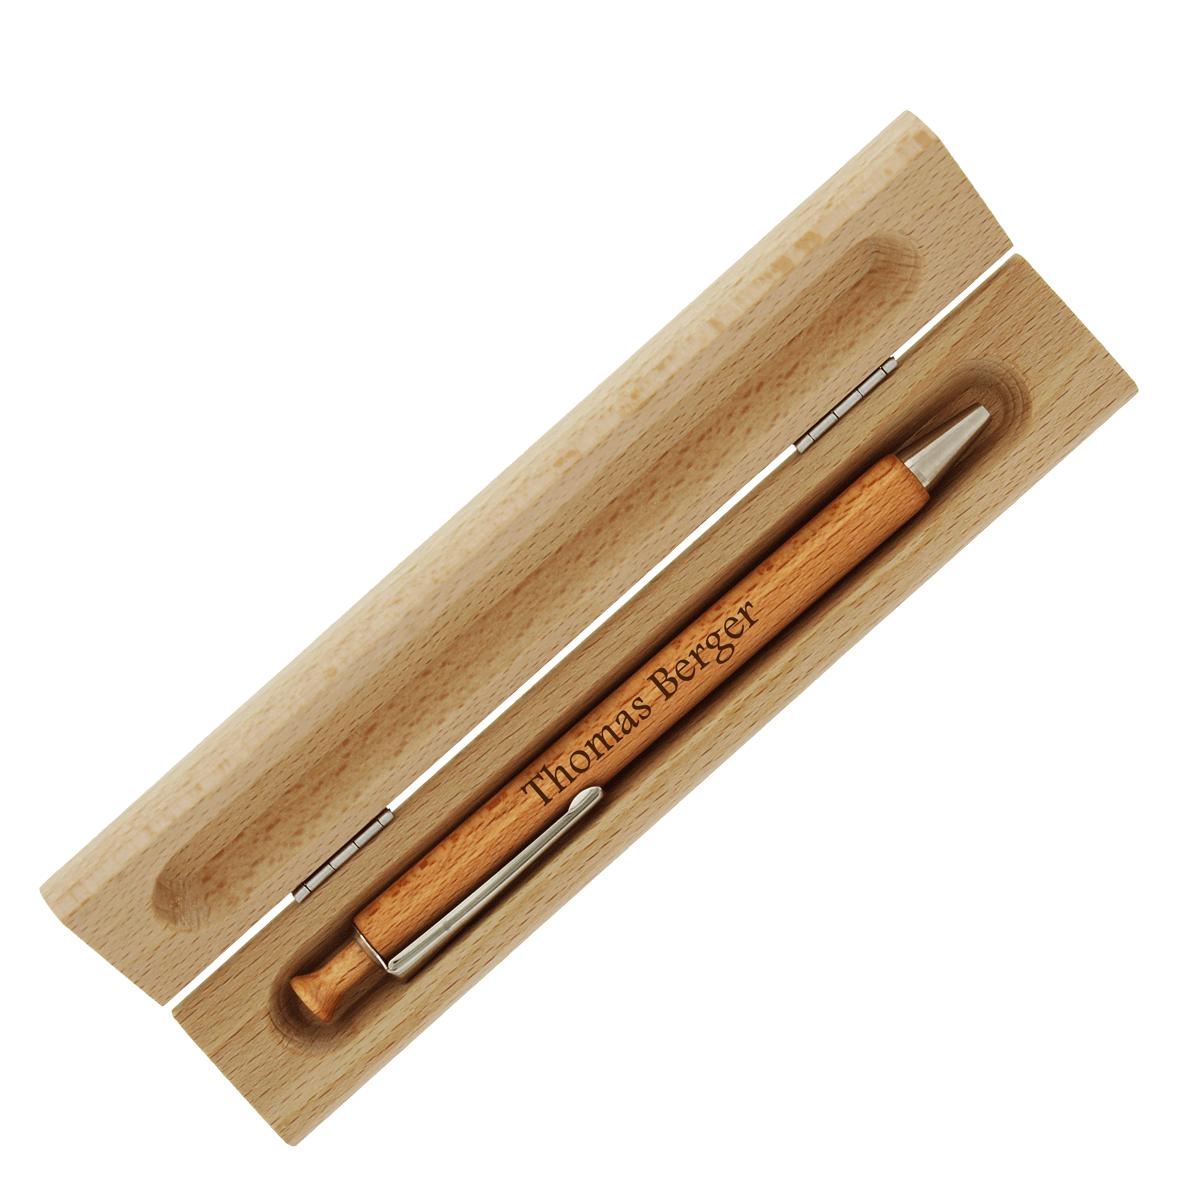 Wunschgravur Holz-Kugelschreiber im Etui inkl